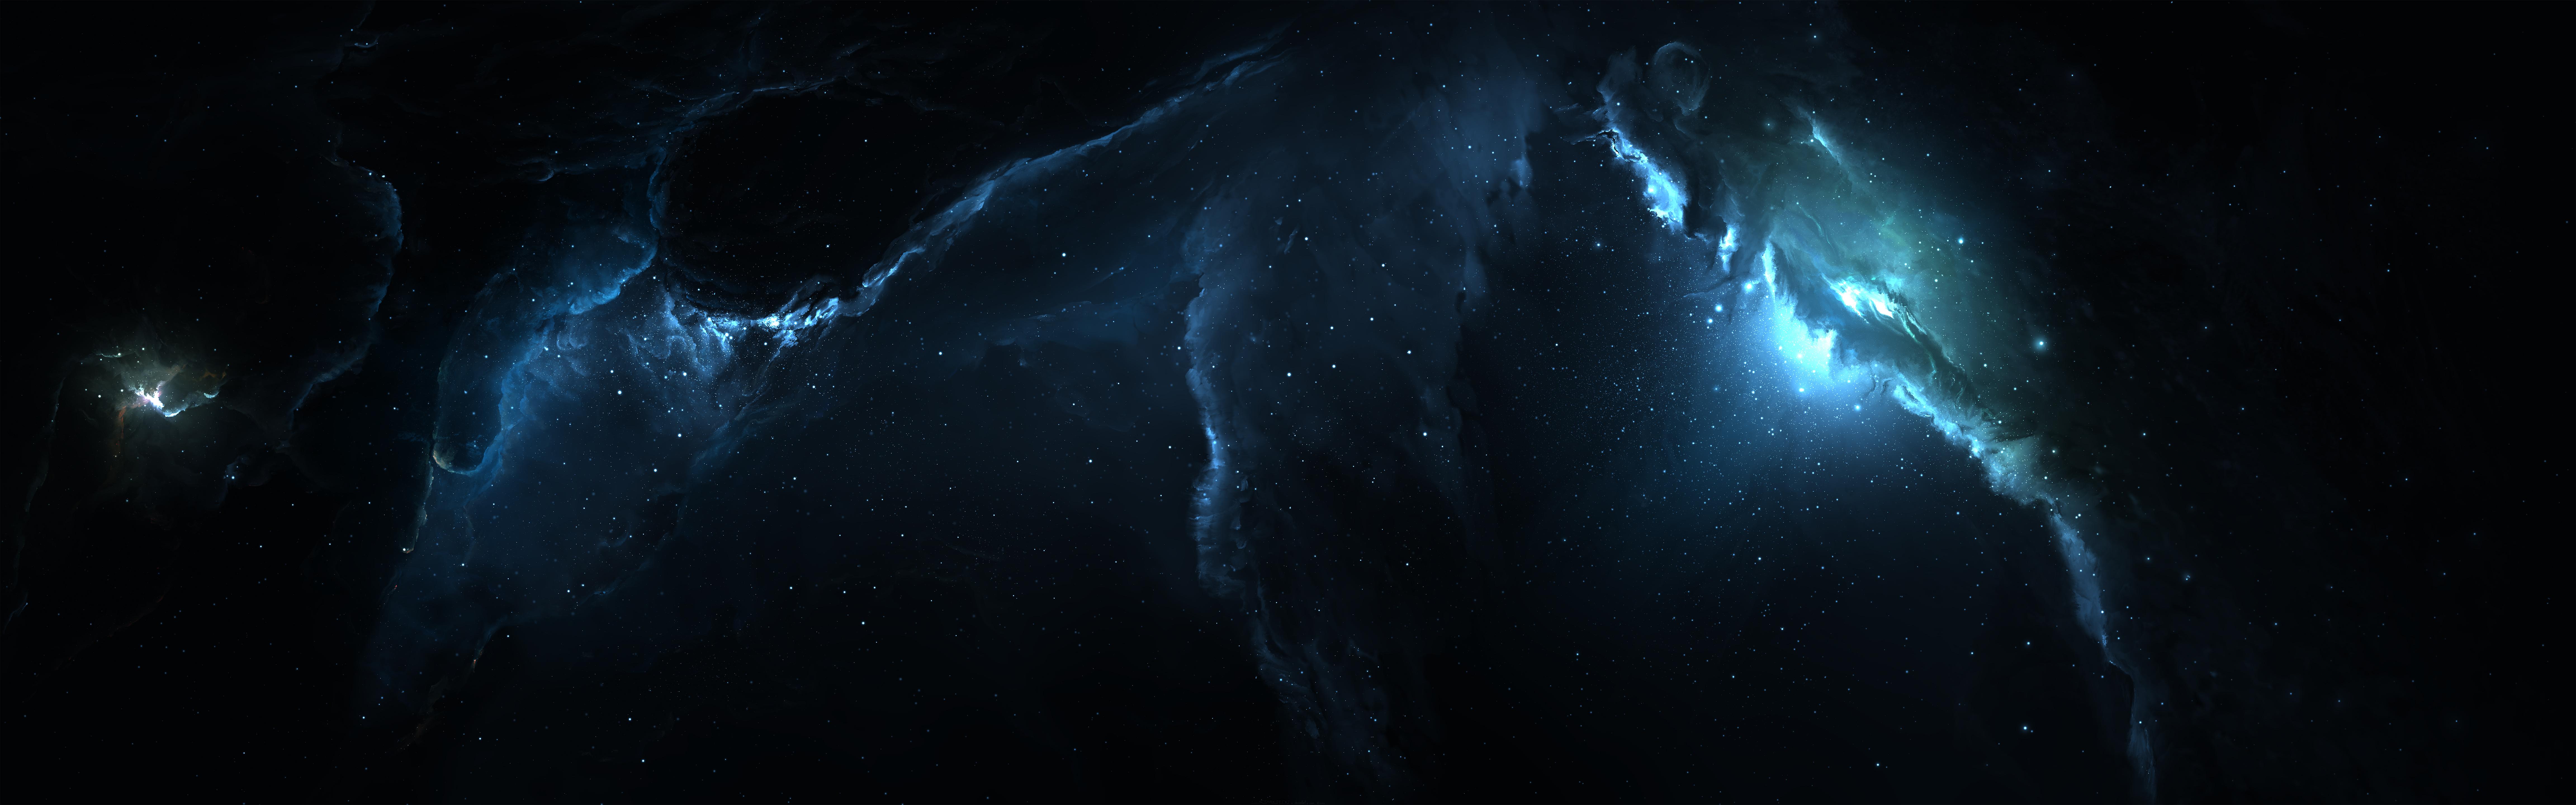 nebula wallpaper iphone x